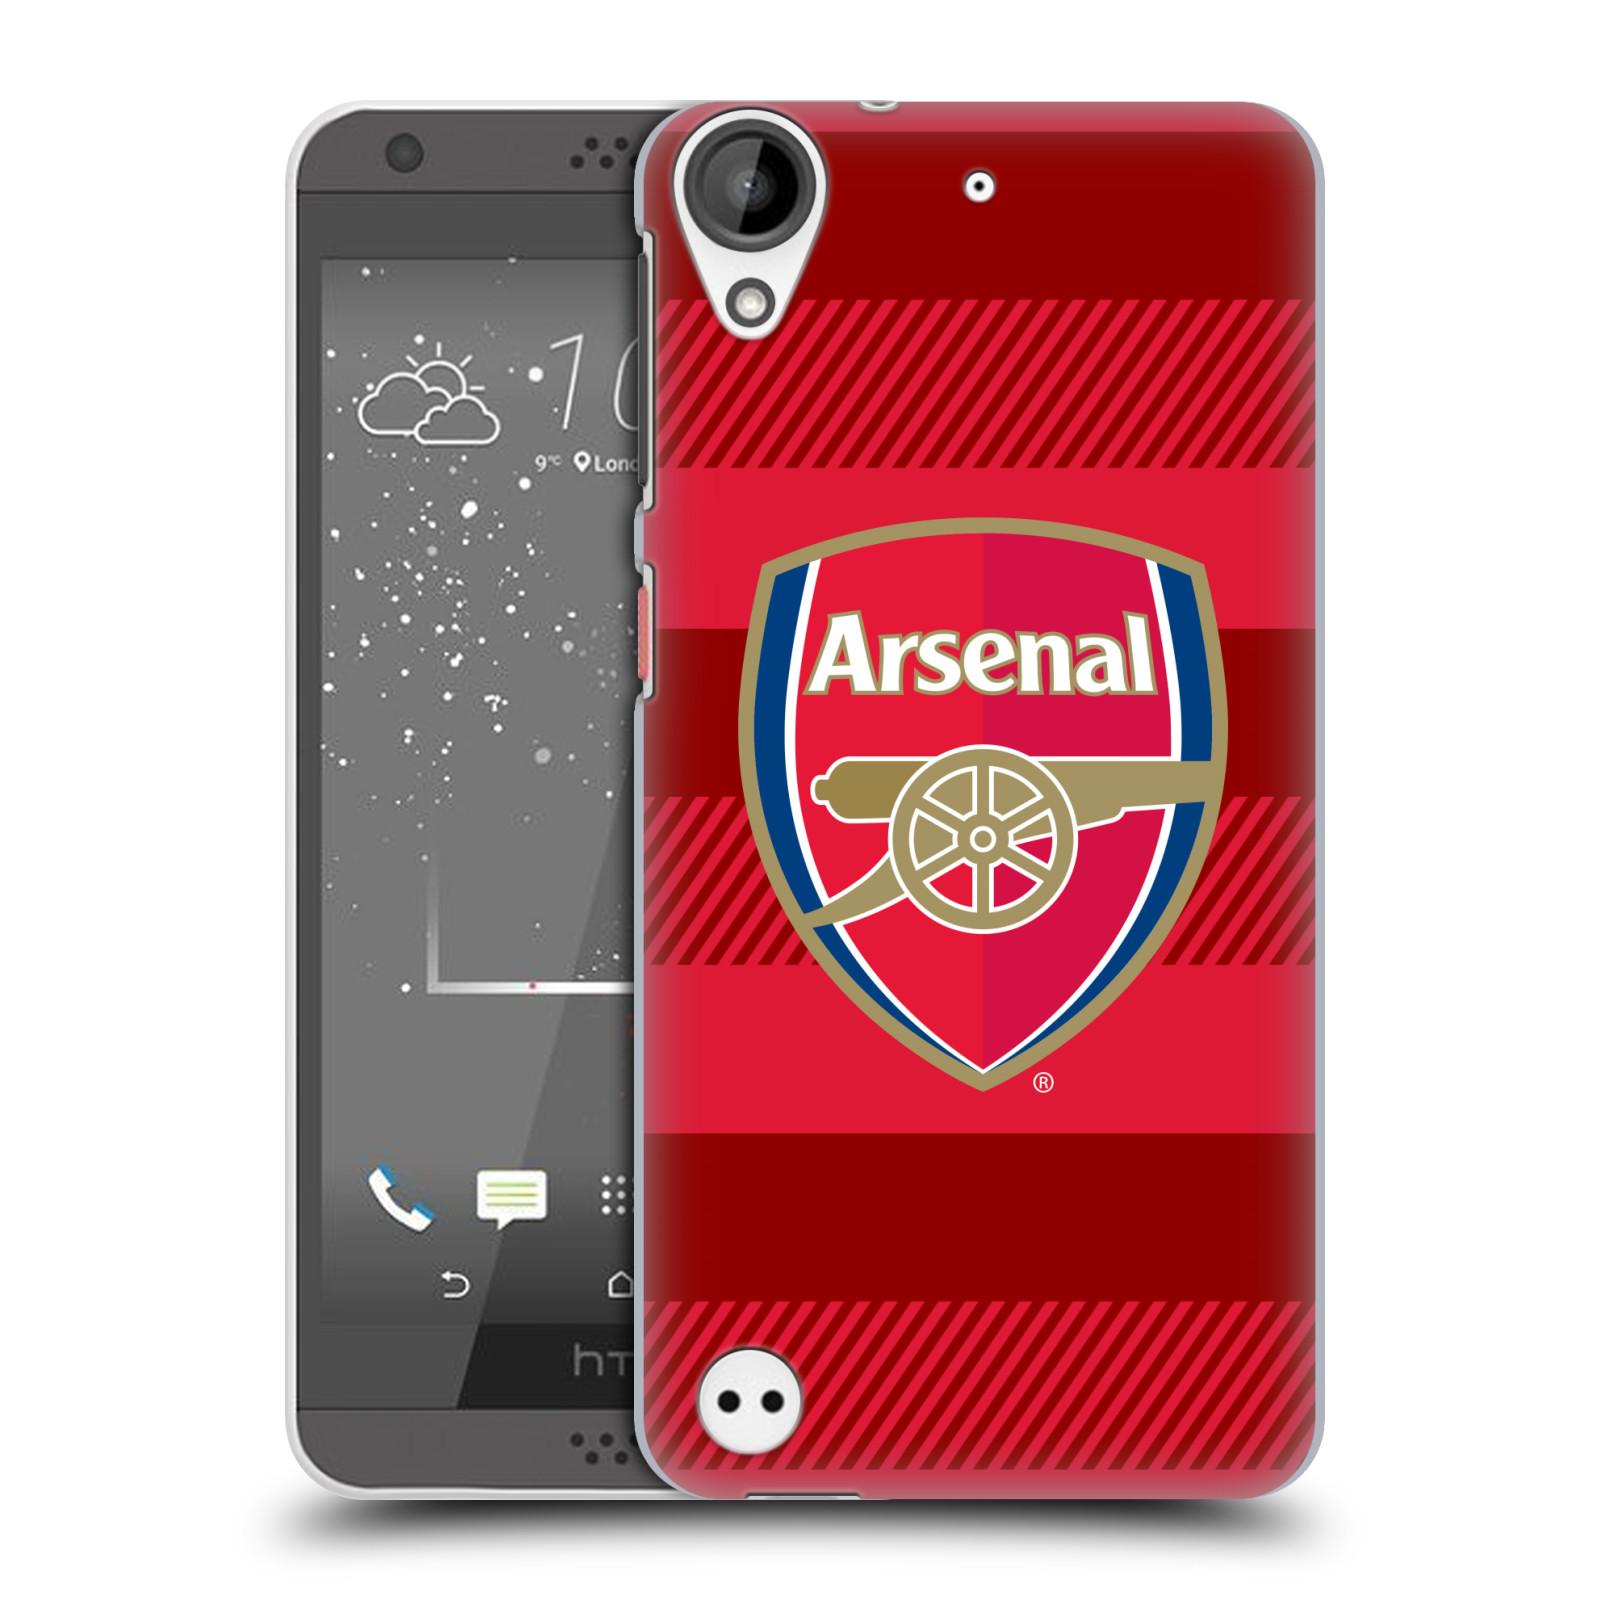 Plastové pouzdro na mobil HTC Desire 530 - Head Case - Arsenal FC - Logo s pruhy